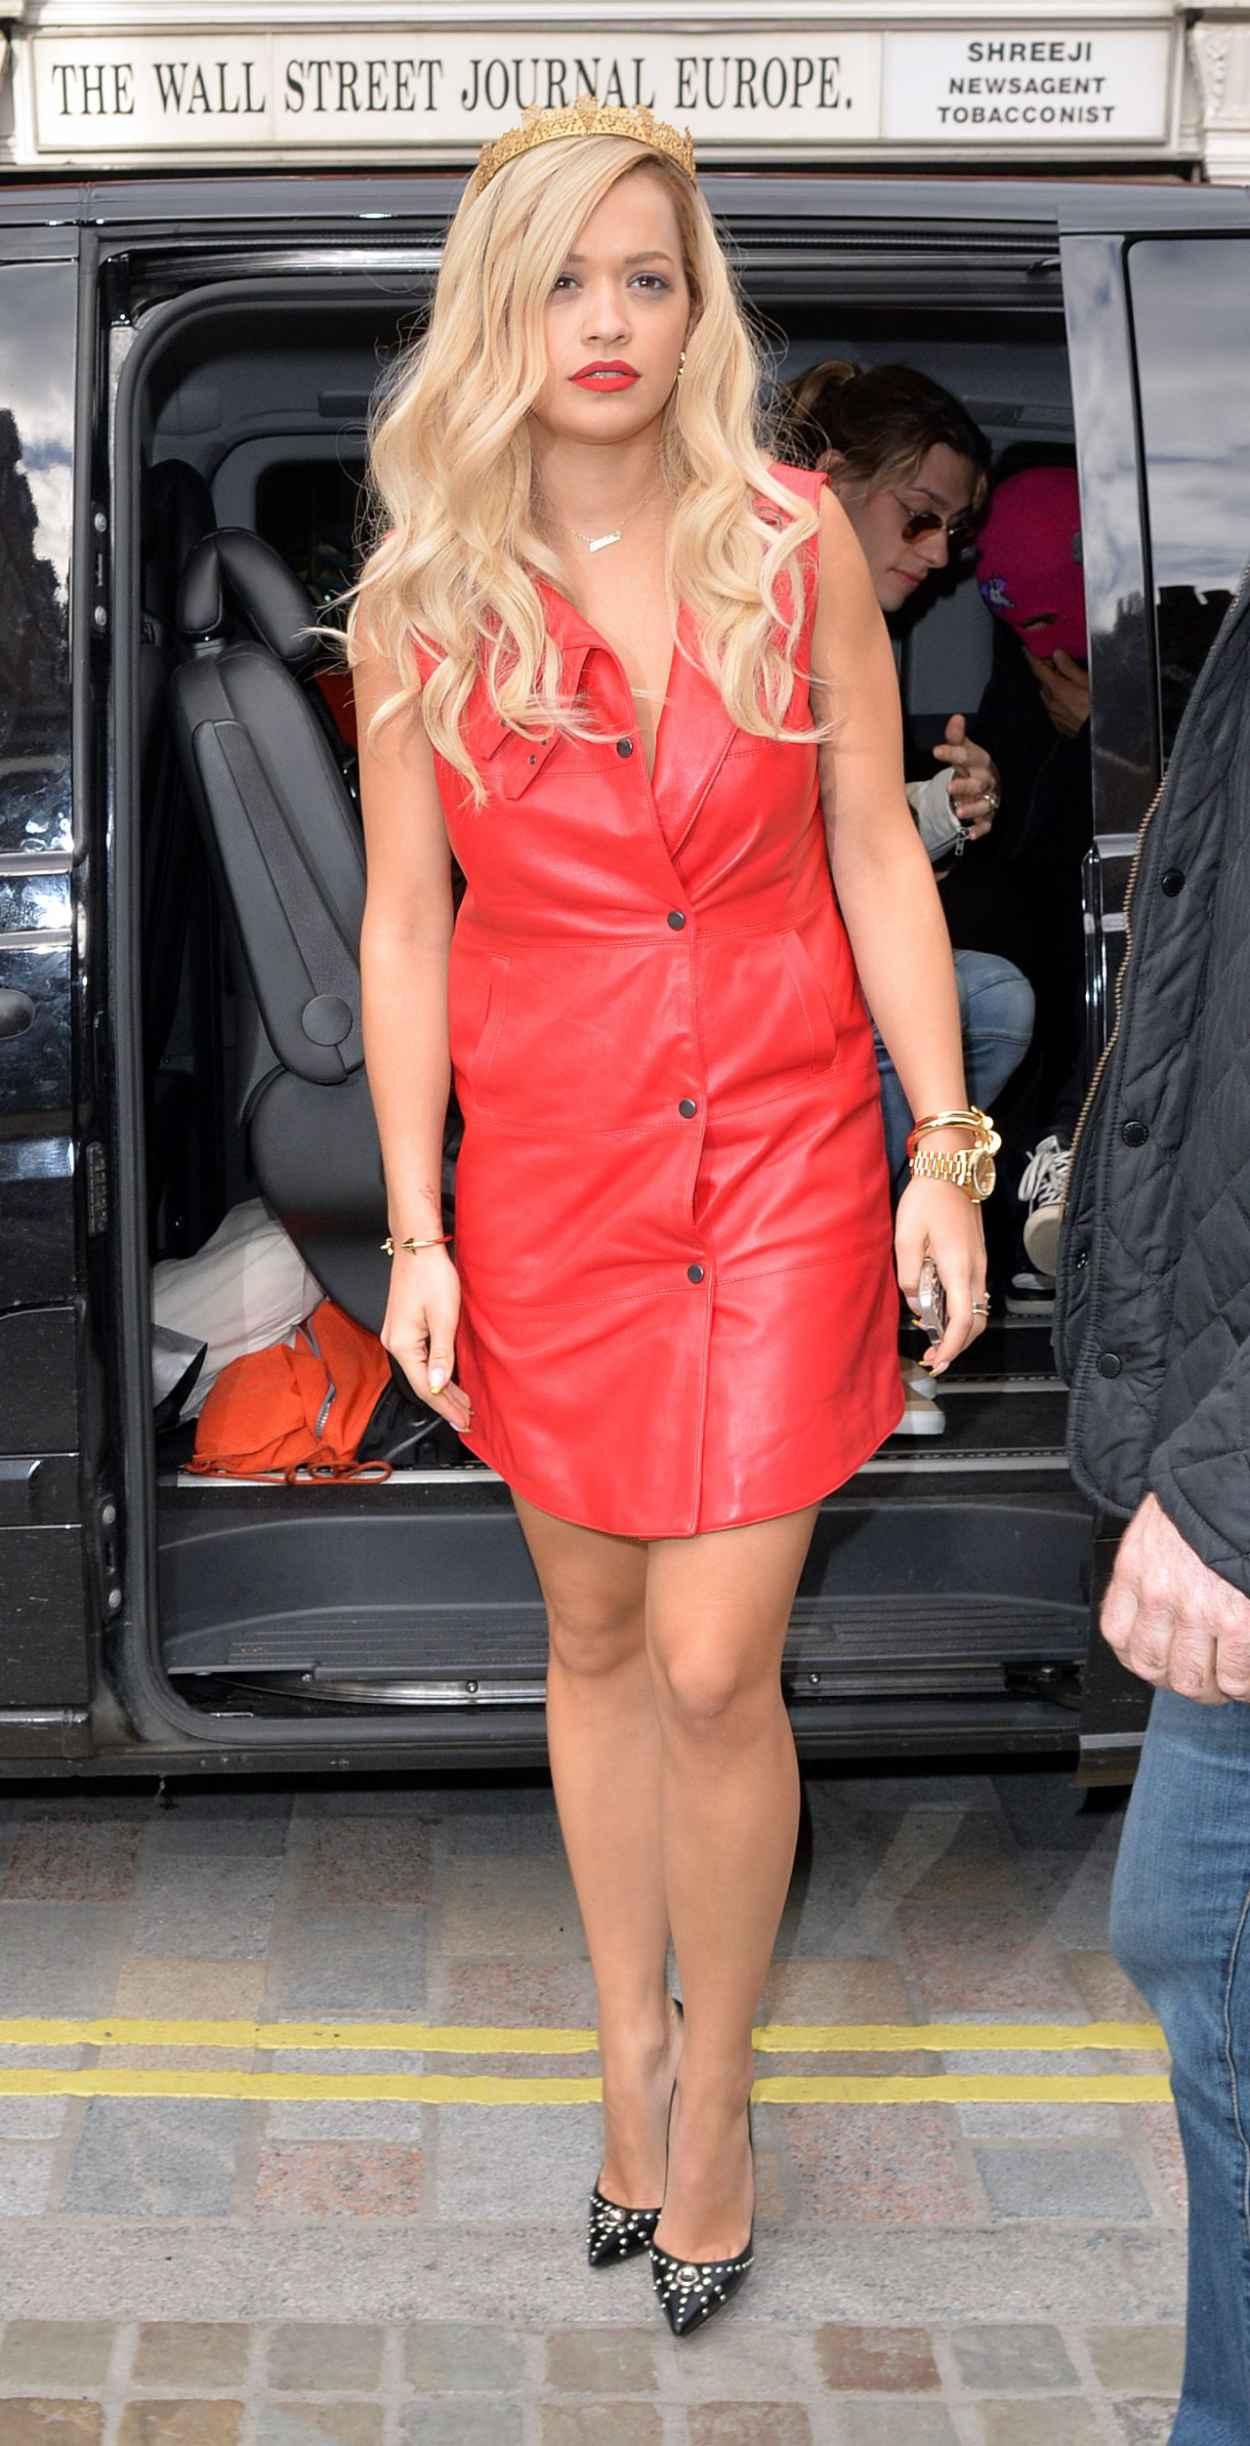 Rita Ora in Red Dress - Capital FM Studios in London - May 2015-1